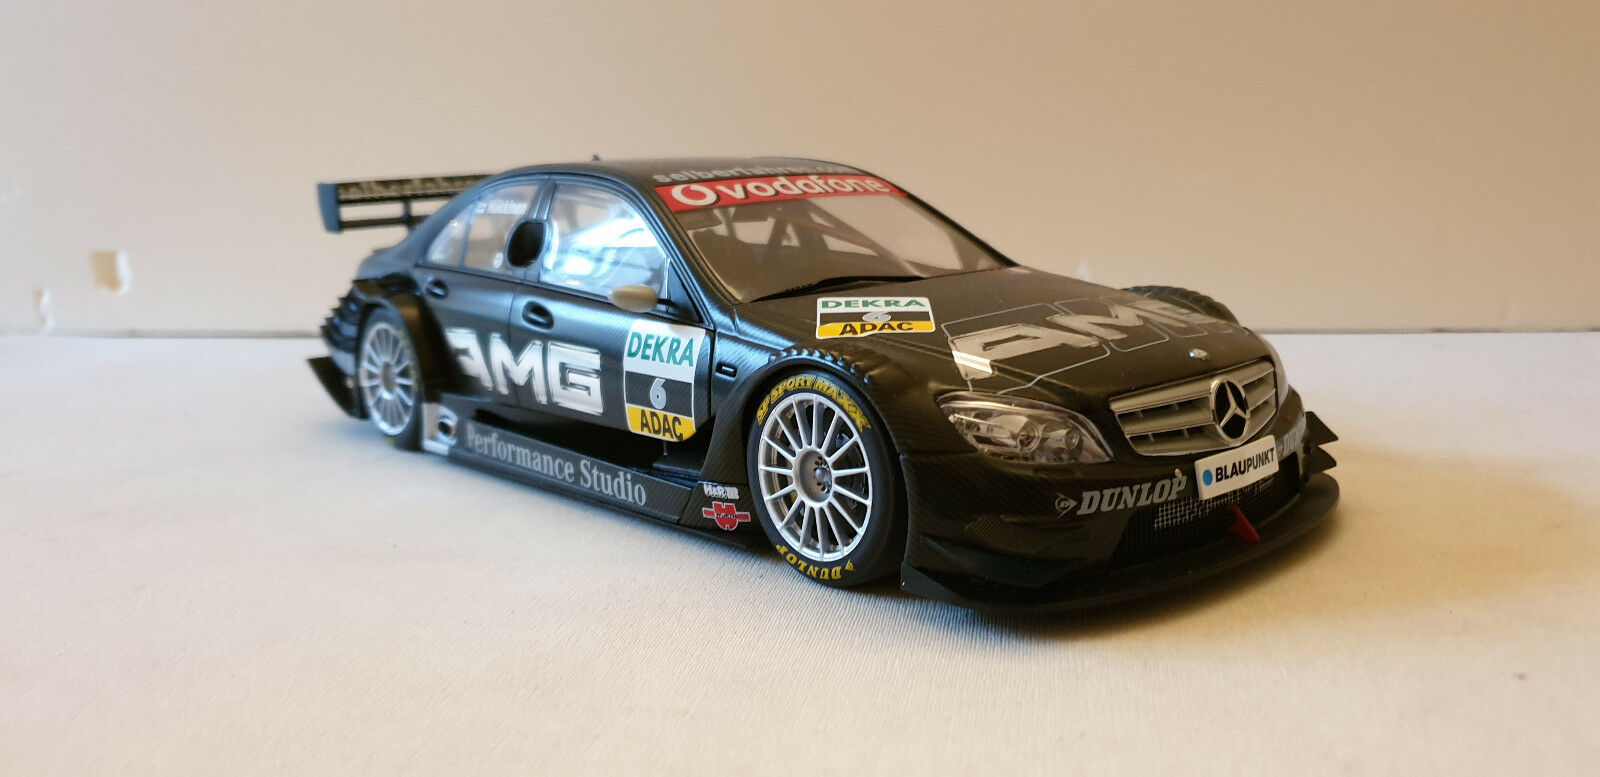 MERCEDES BENZ AMG DTM 2007 C-CLASS  V8 MIKA HAKKINEN  6 1 18 AUTOART  réductions incroyables